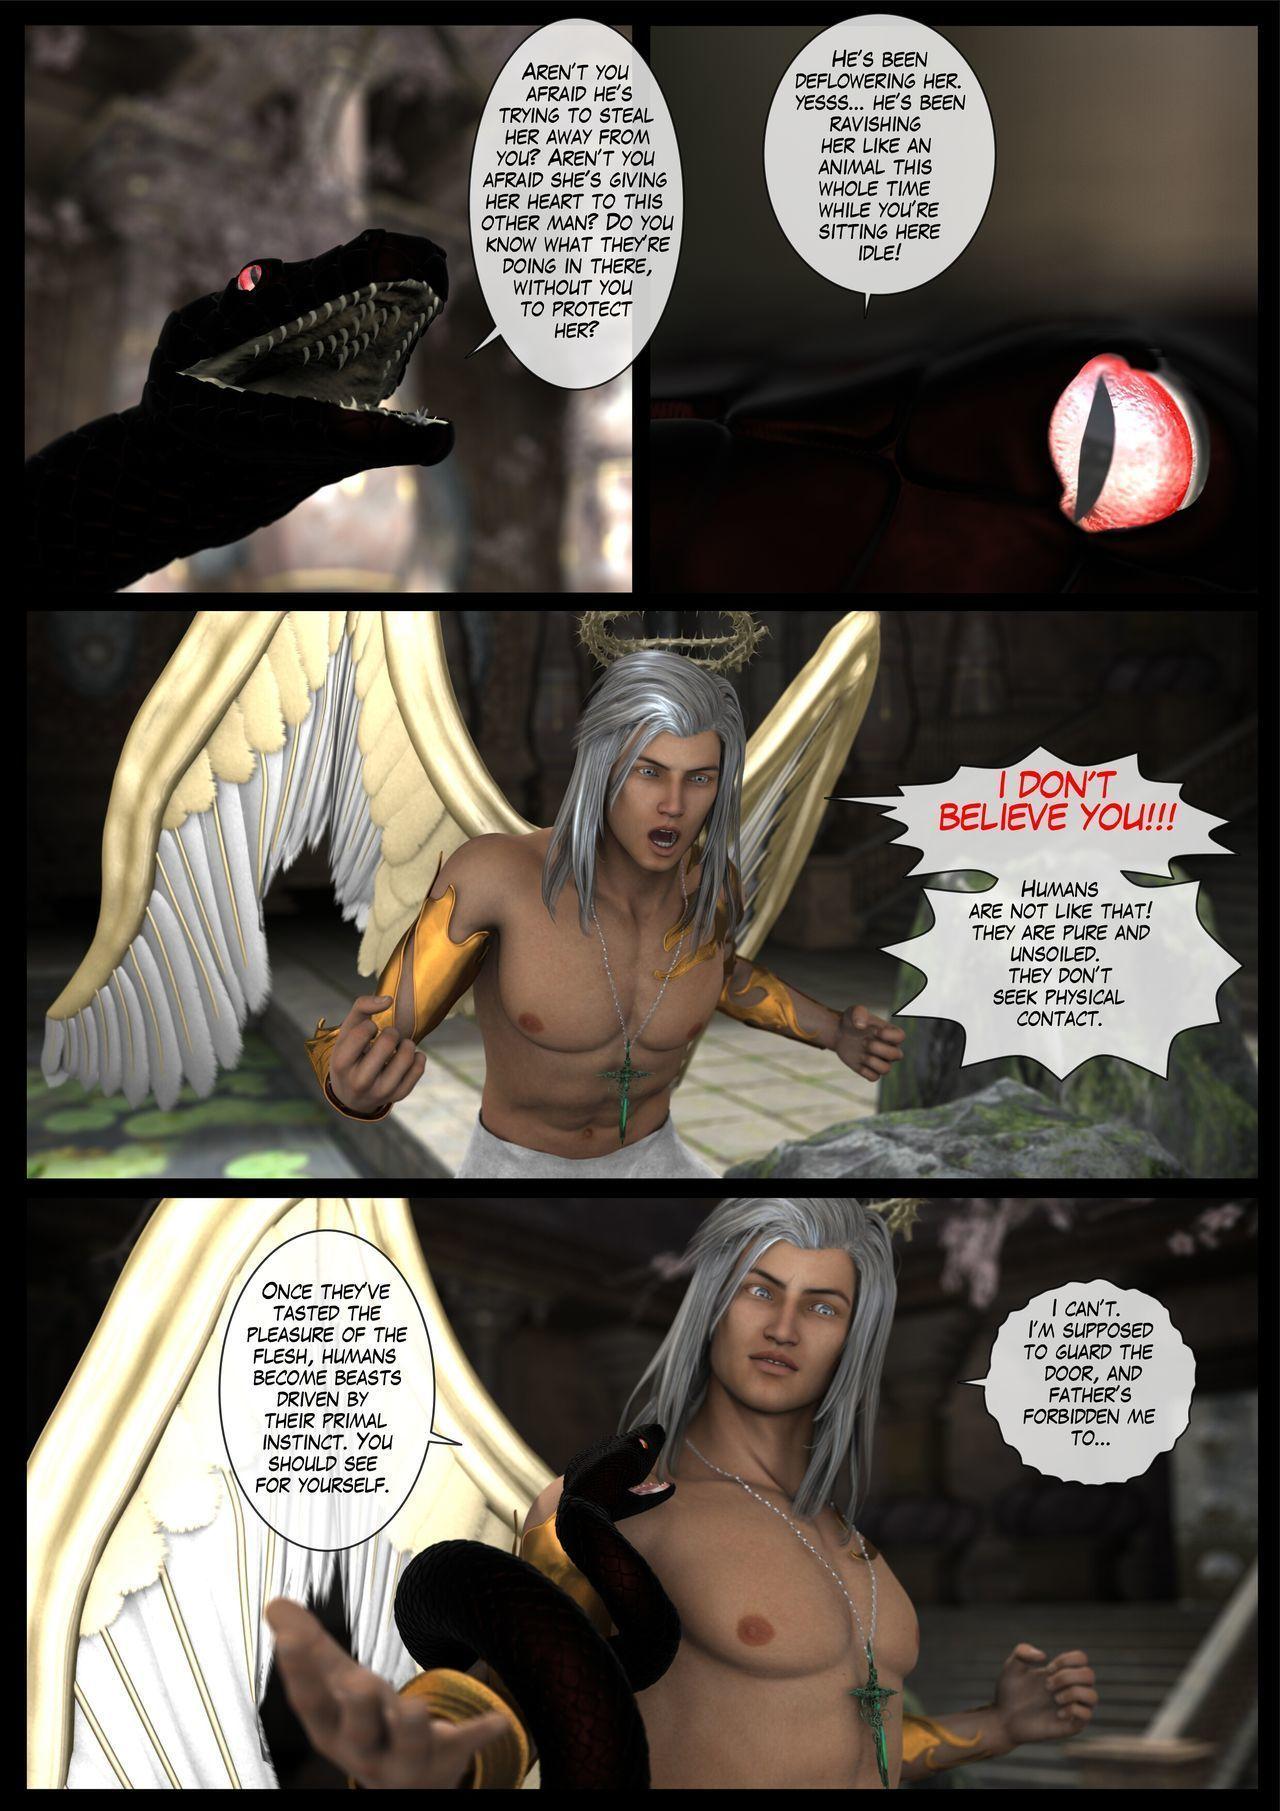 [Shinra-kun] The Fallen Star Ch. 9: Liber Genesis - Part 1